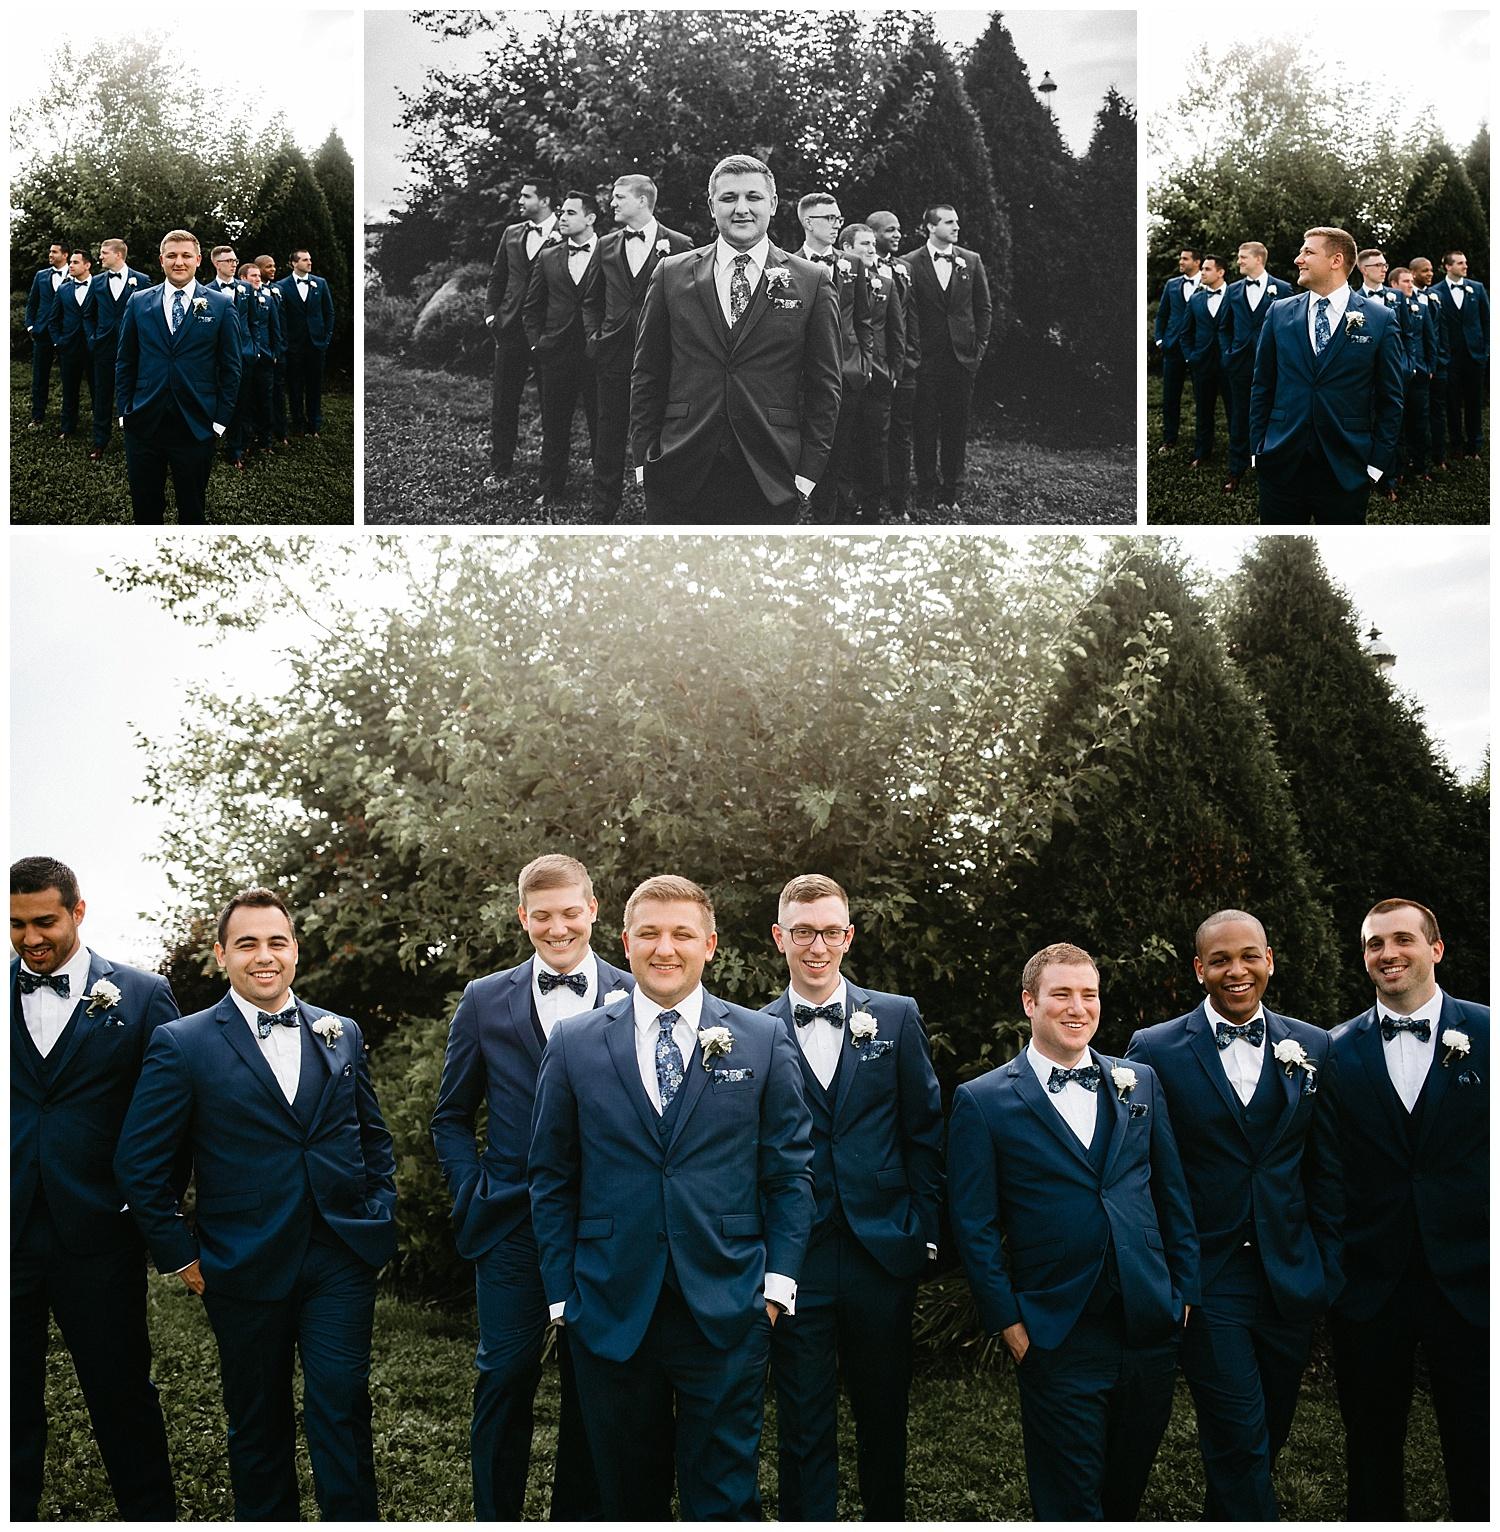 Destination-Wedding-Photographer-in-NEPA-Palmerton-PA_0009.jpg